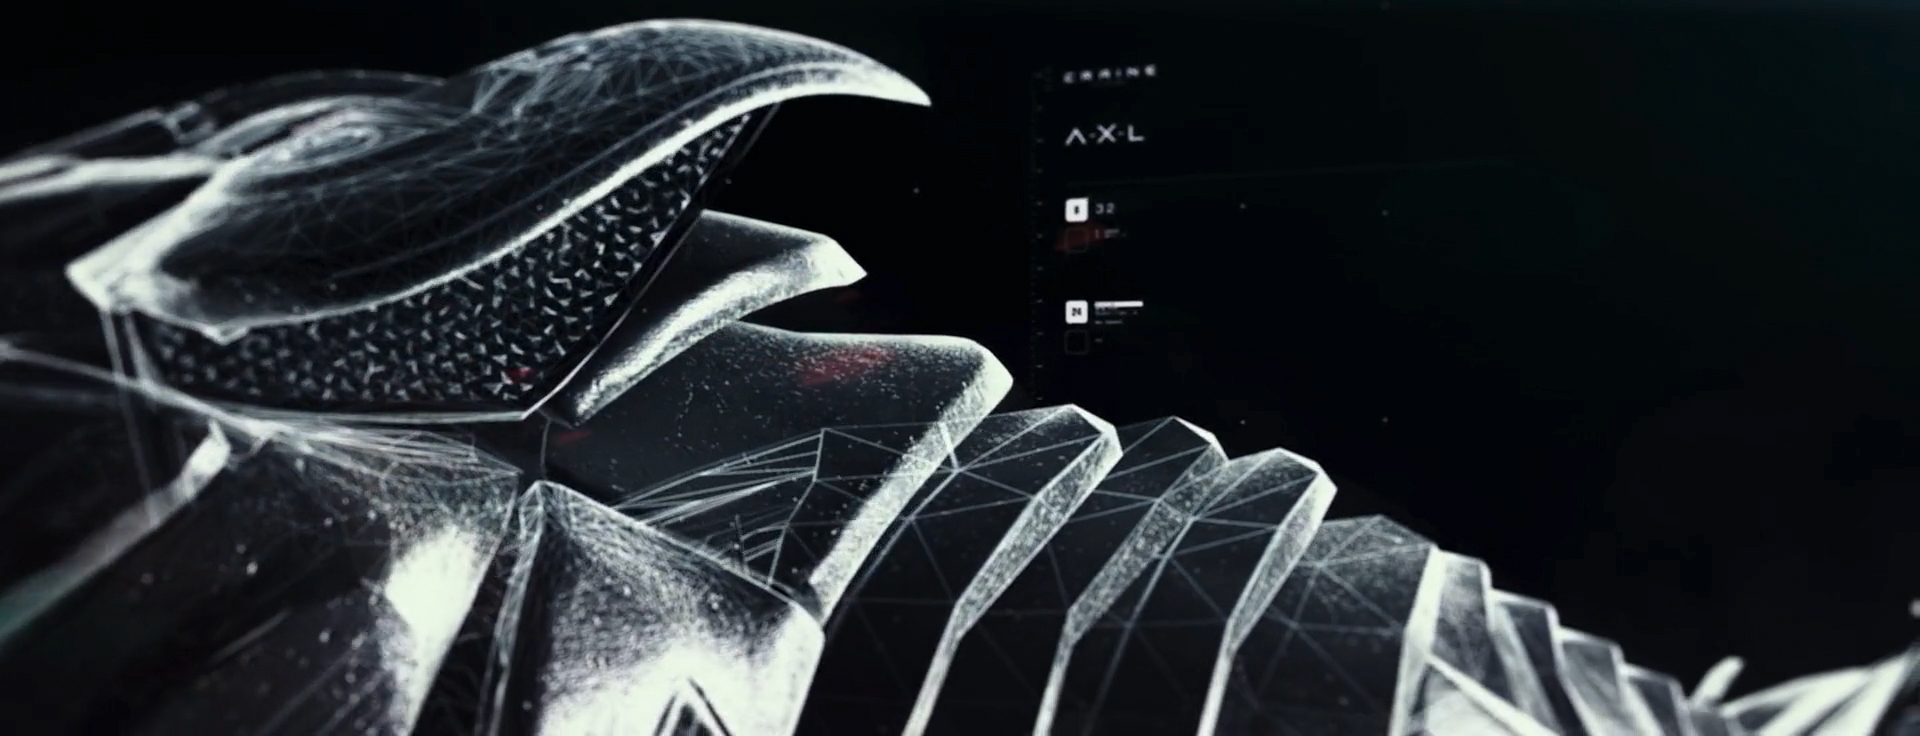 A-X-L_OpeningTitles_07.jpg